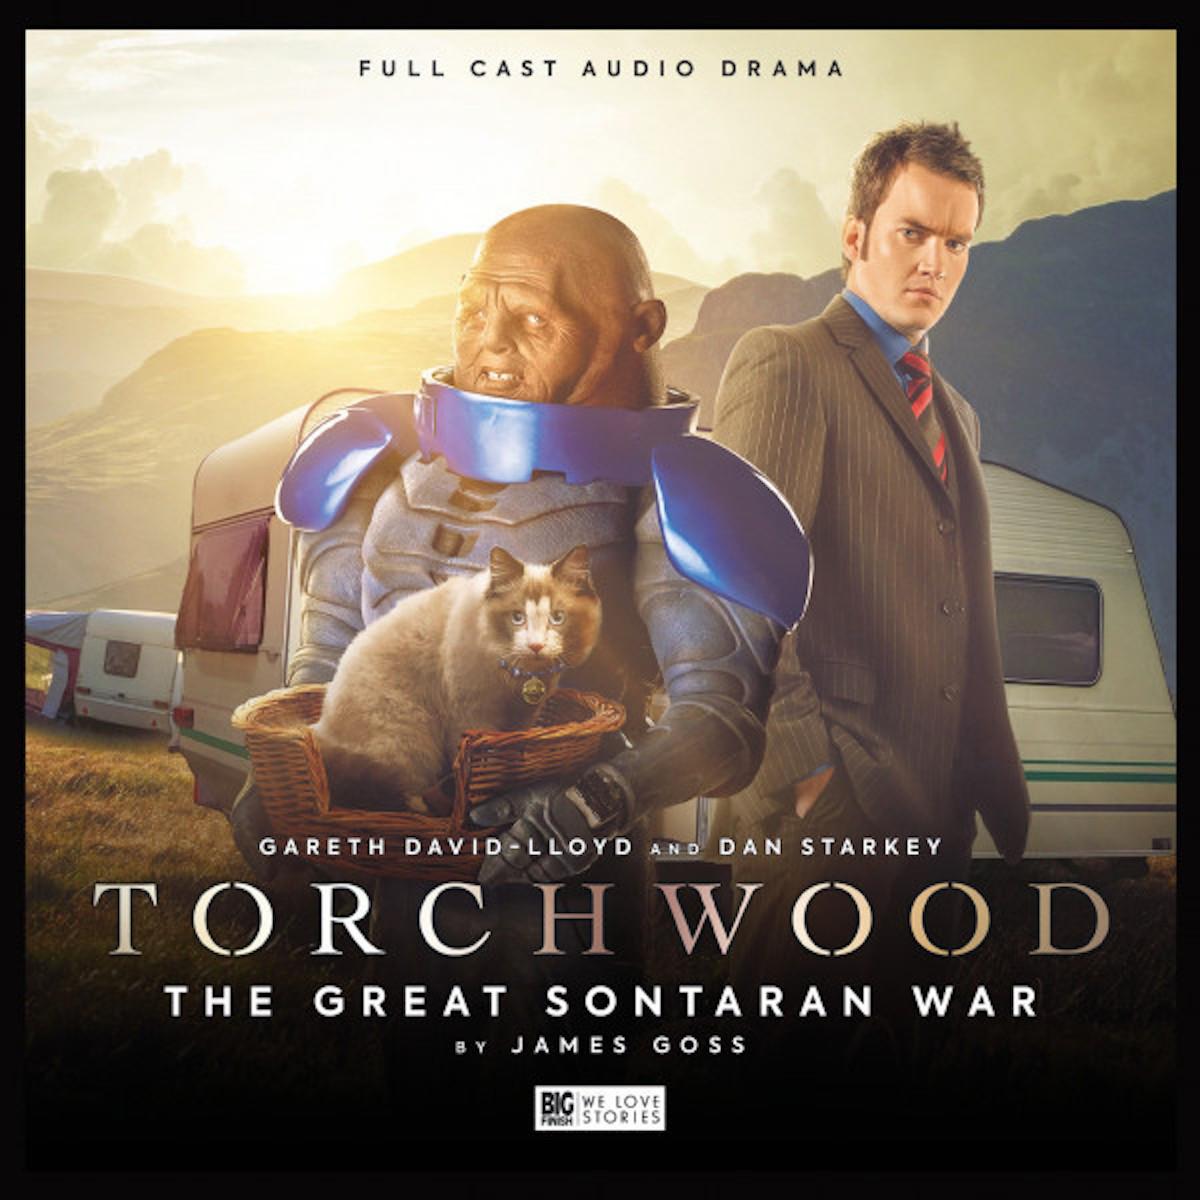 Torchwood: The Great Sontaran War